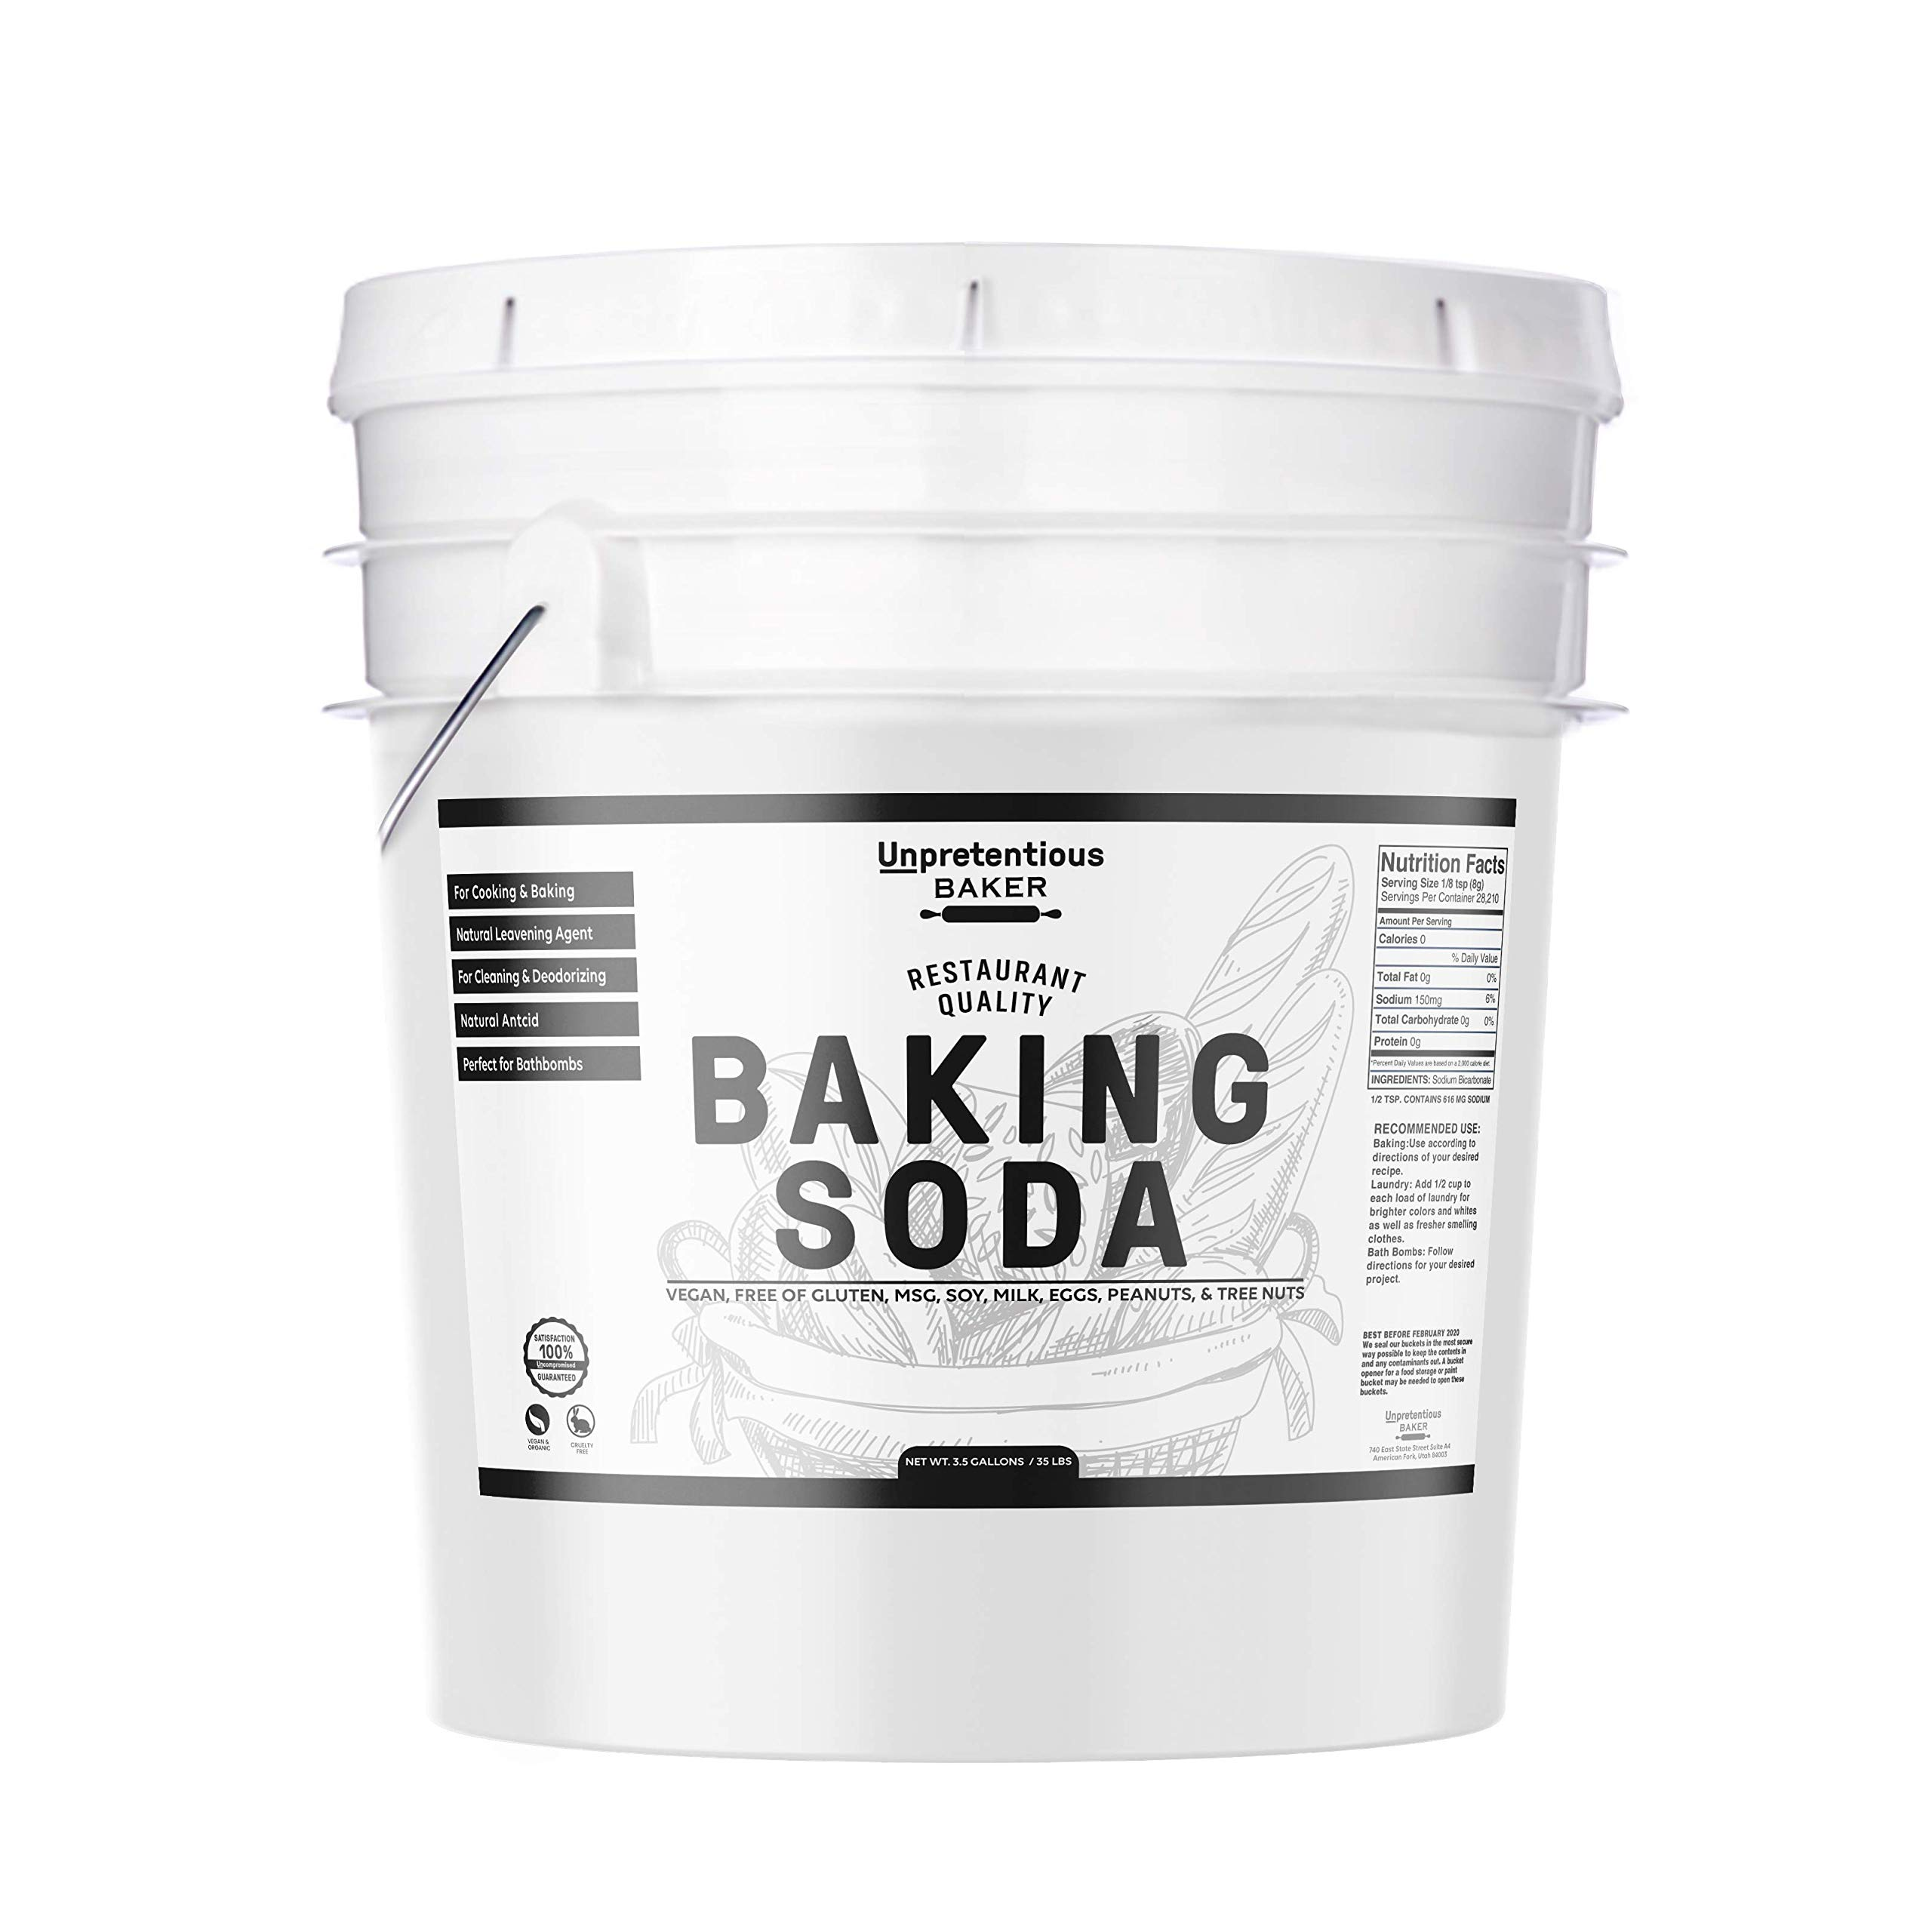 Baking Soda (Sodium Bicarbonate) by Unpretentious Baker, 3.5 gallon, Resealable Bucket, Restaurant Quality, Highest Purity, Food & USP Pharmaceutical Grade